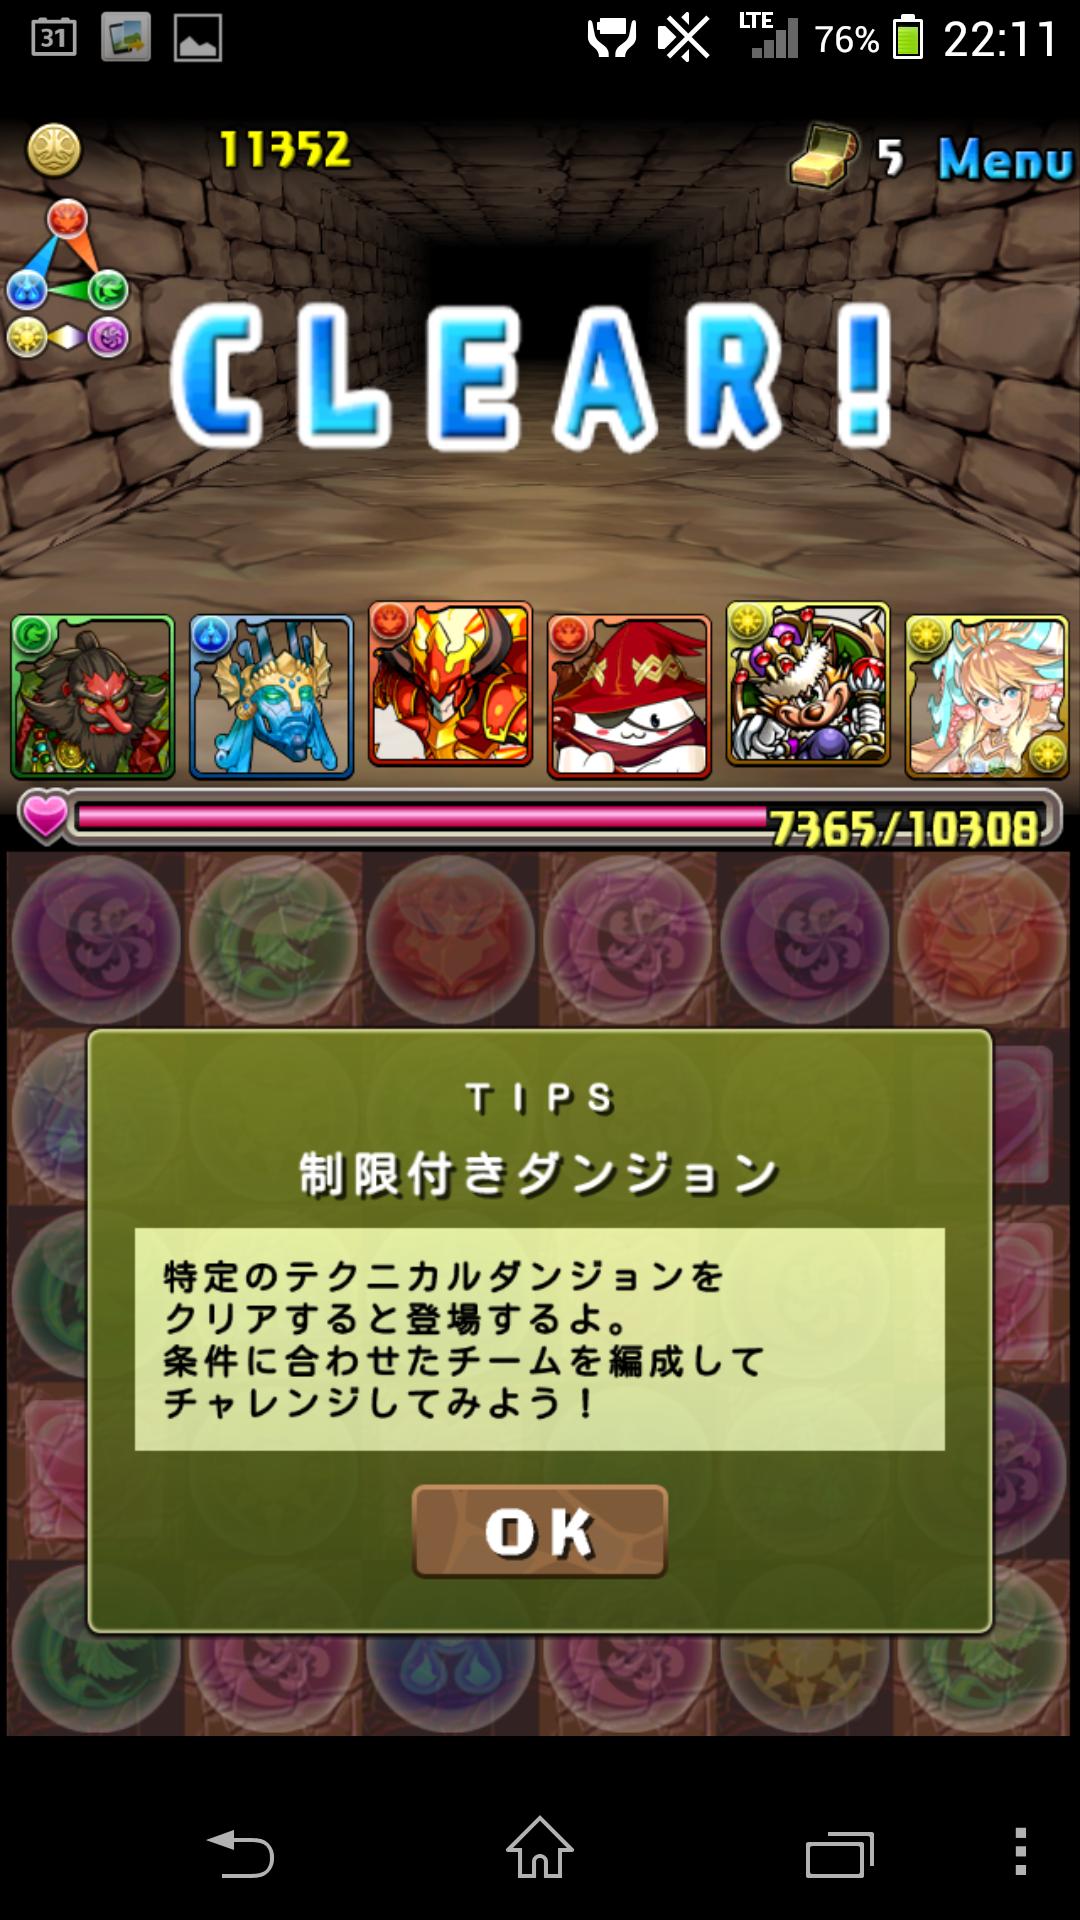 Screenshot_2014-05-12-22-11-35.png